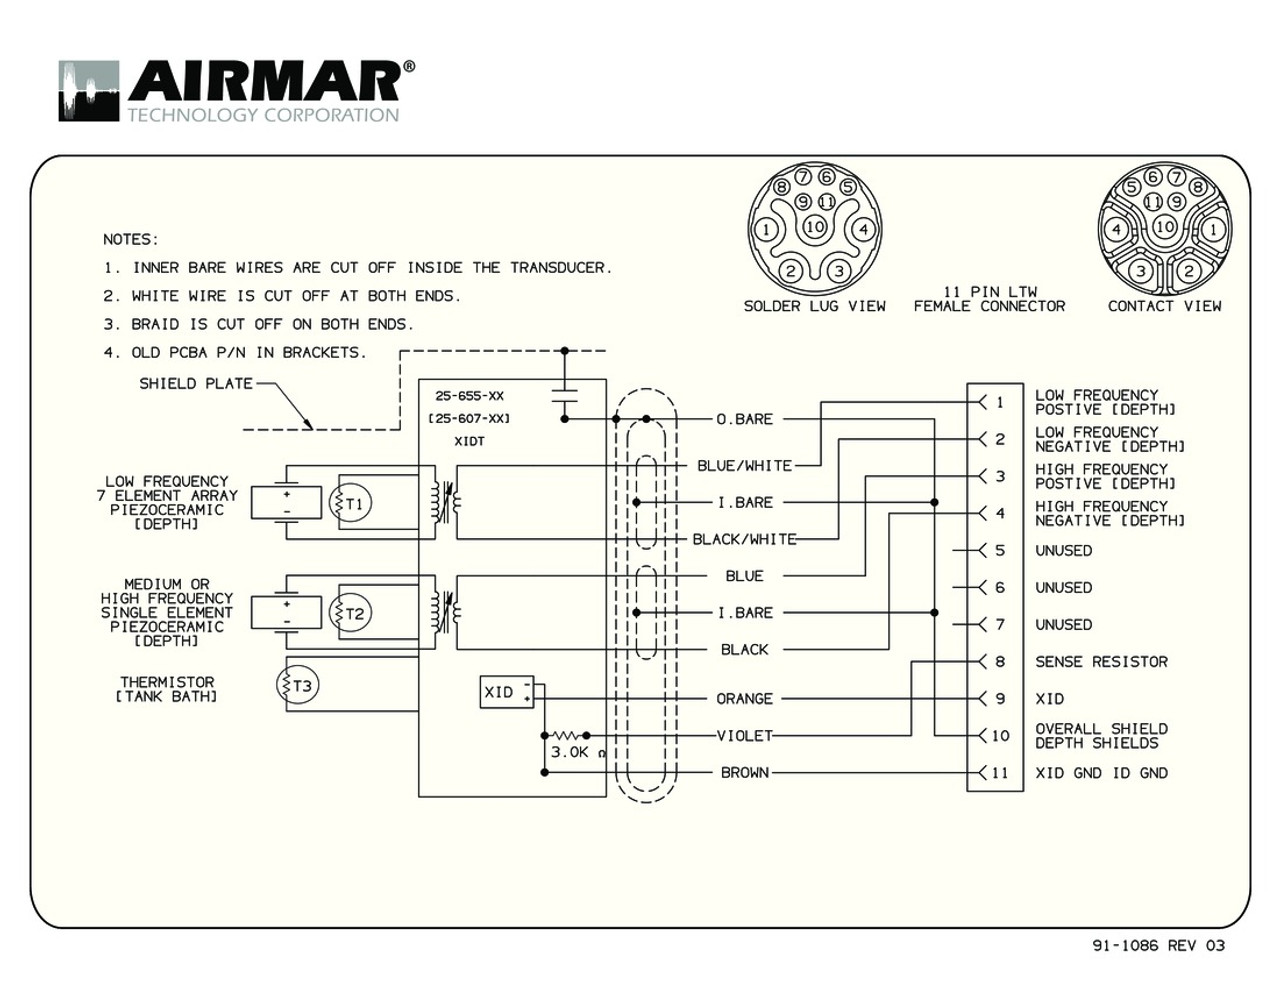 raymarine transducer wiring diagram samsung wiring diagrams panasonic airmar wiring diagram m265 blue bottle marine on [ 1280 x 989 Pixel ]